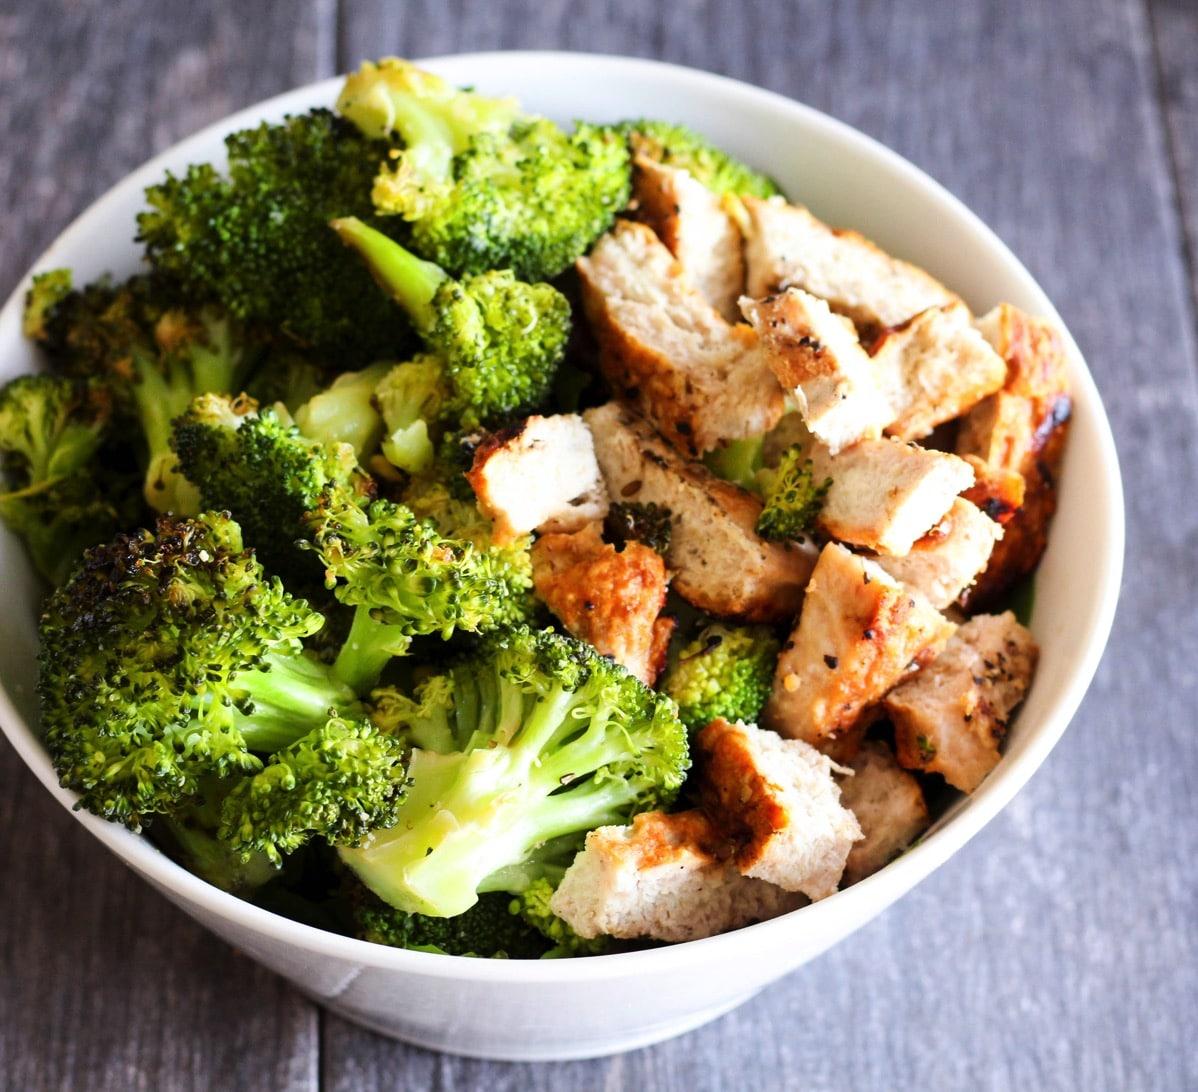 Broccoli and turkey burger